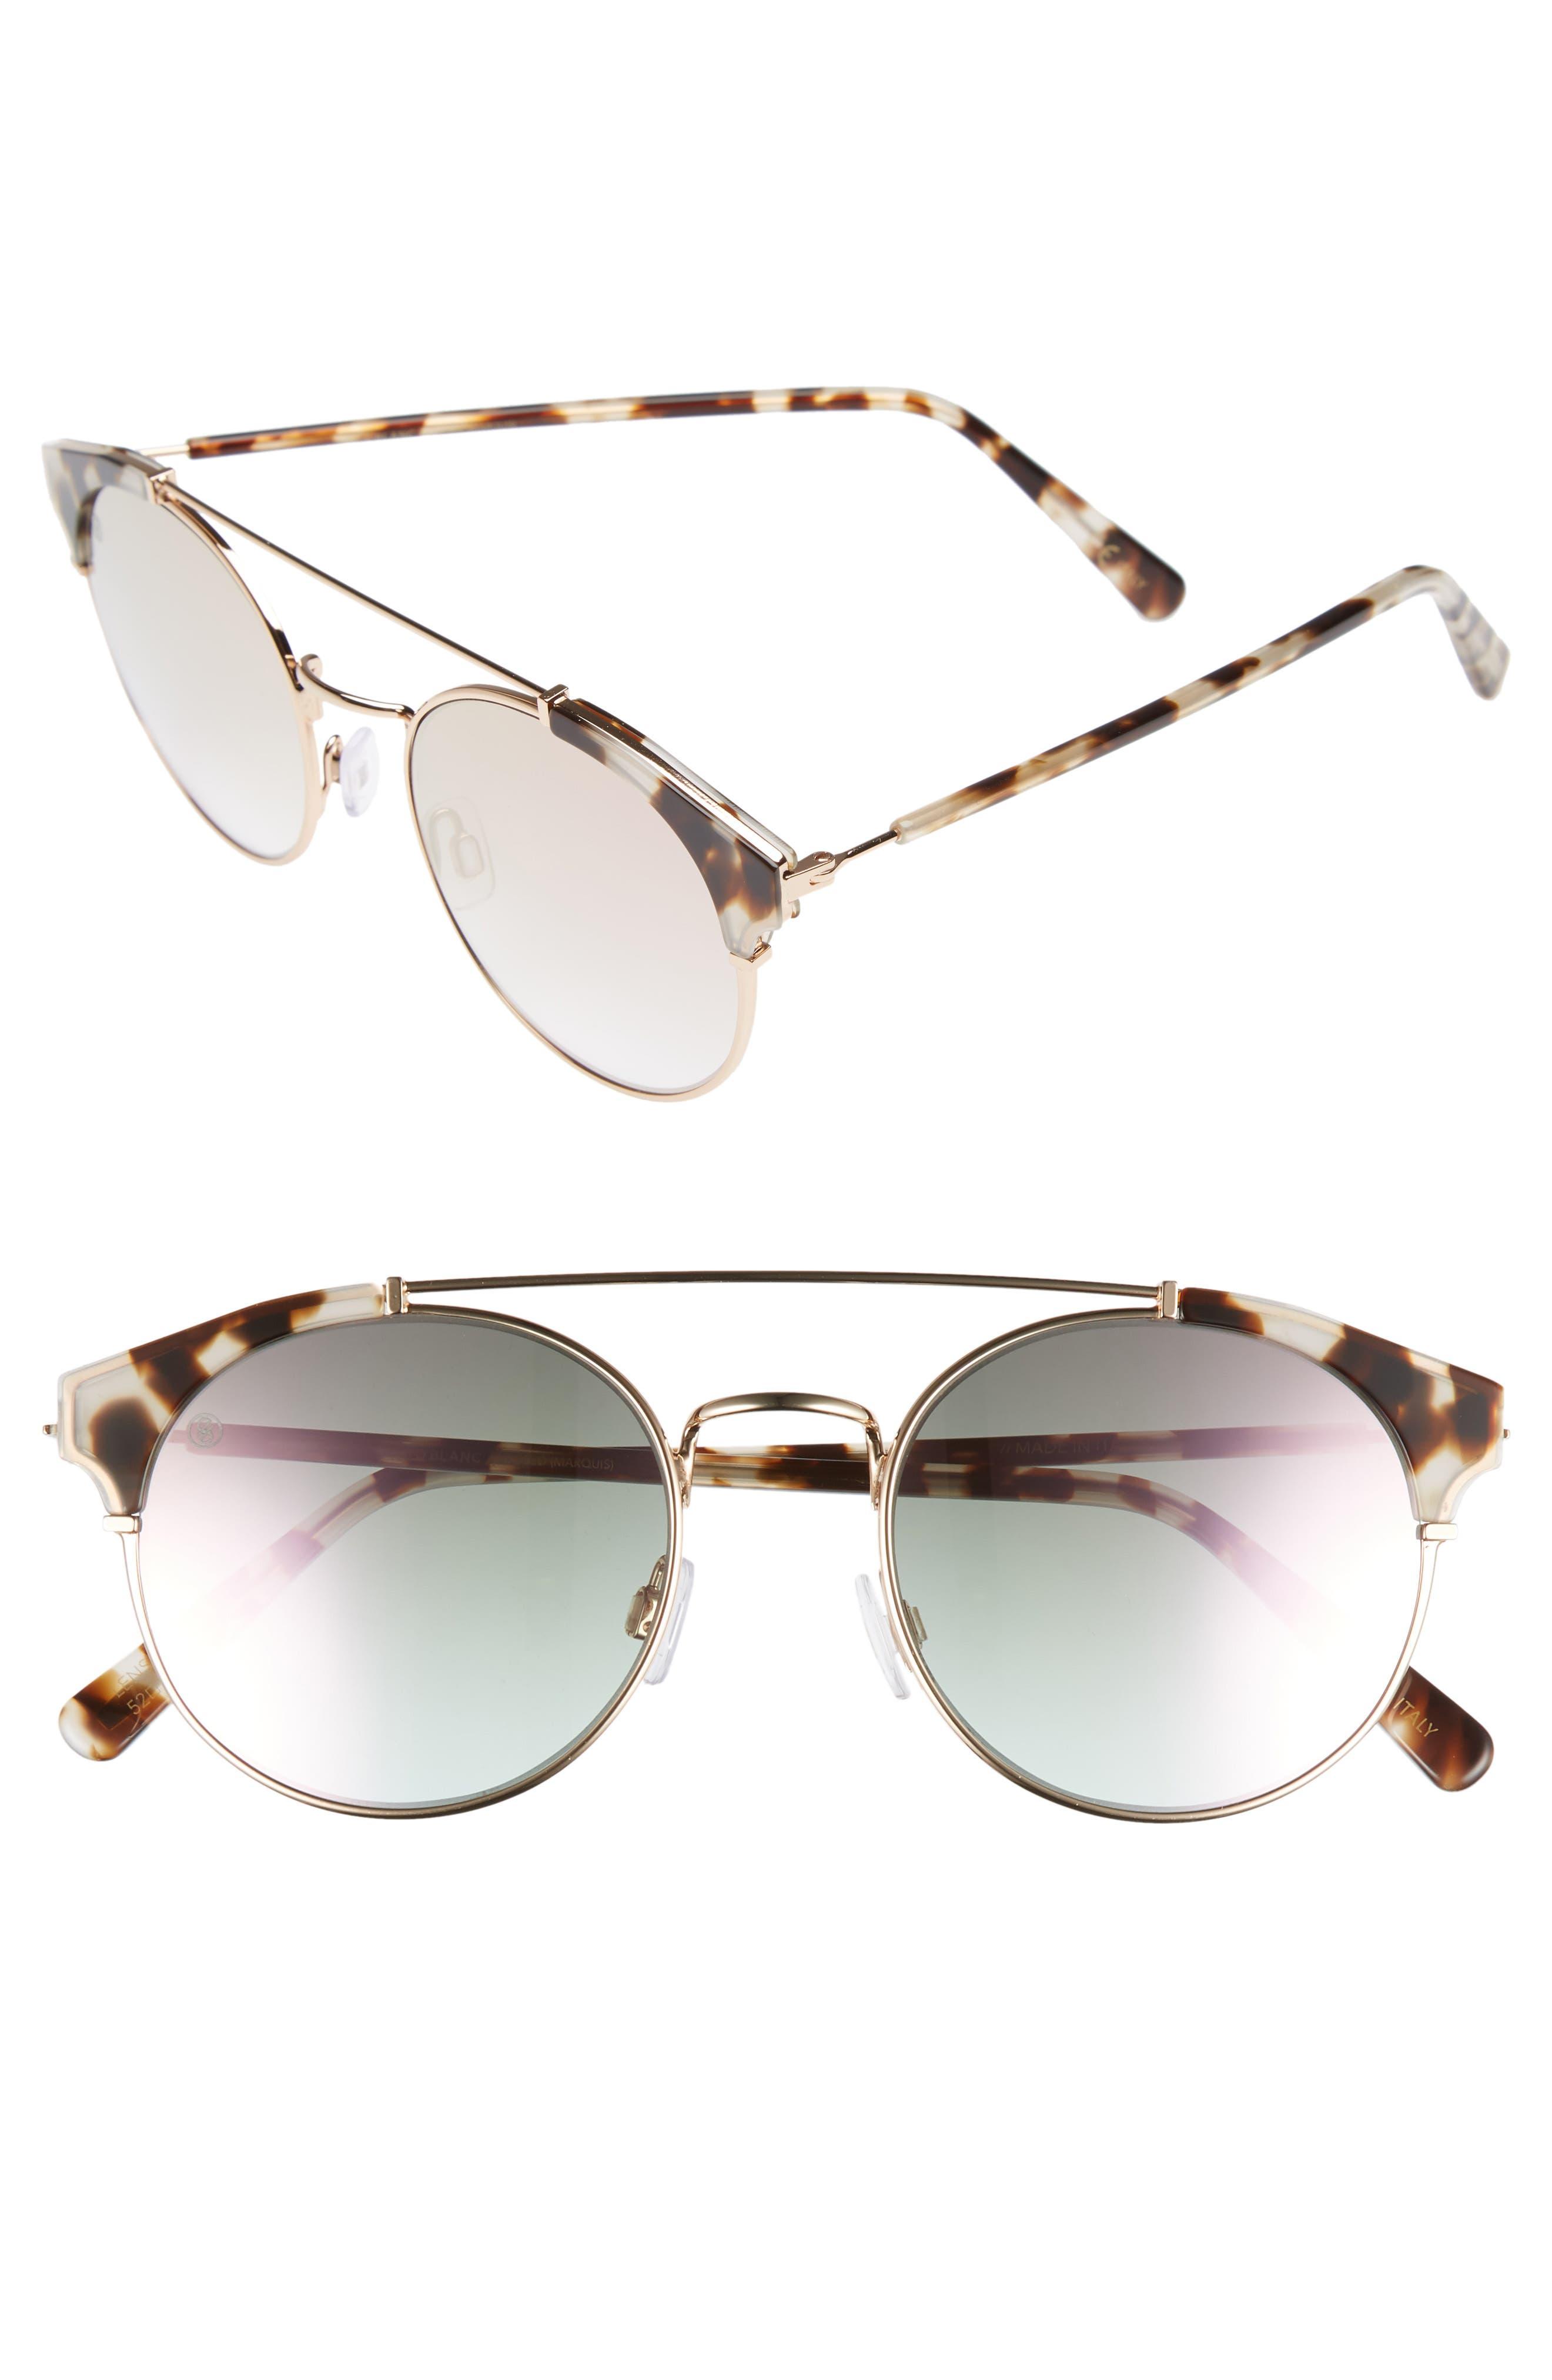 DBLANC,                             D'BLANC x Amuse Society Dosed Marquis 52mm Gradient Round Aviator Sunglasses,                             Main thumbnail 1, color,                             200